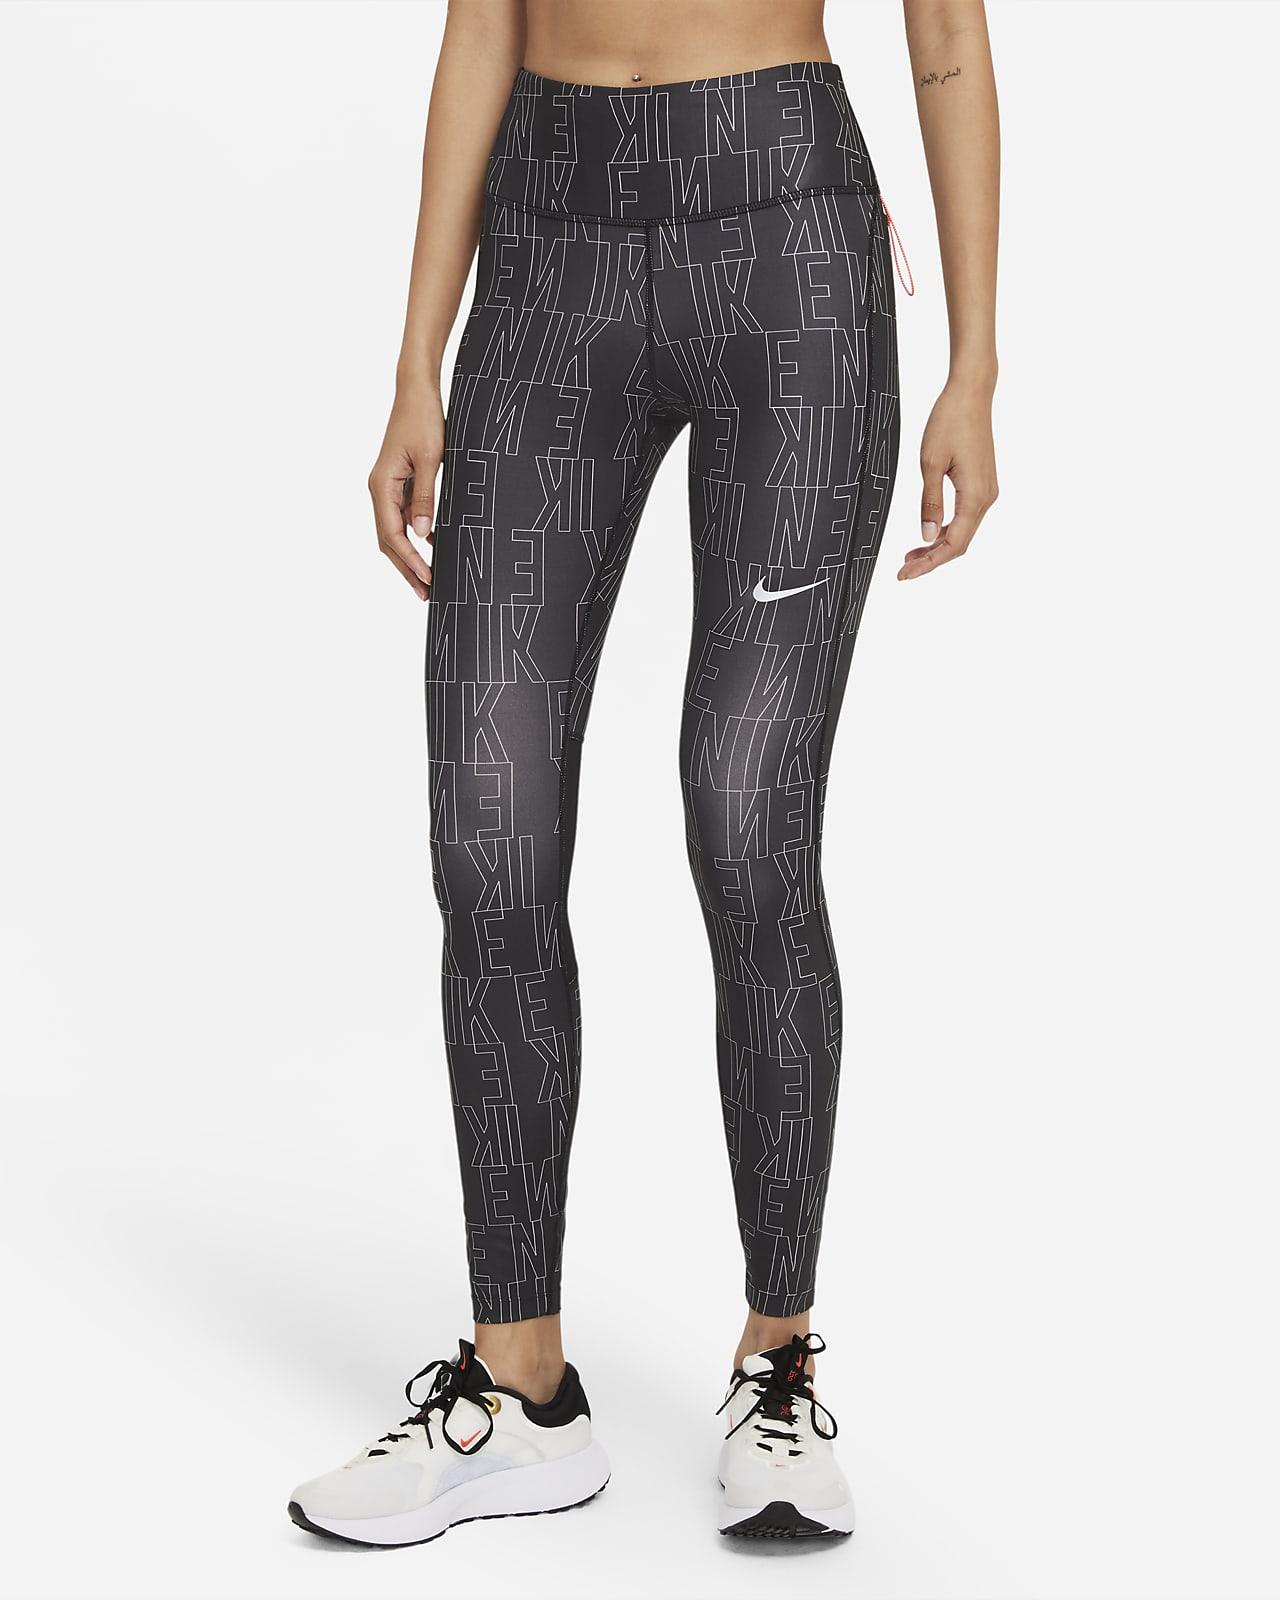 Nike Dri-FIT Run Division Epic Fast Women's Mid-Rise Running Leggings